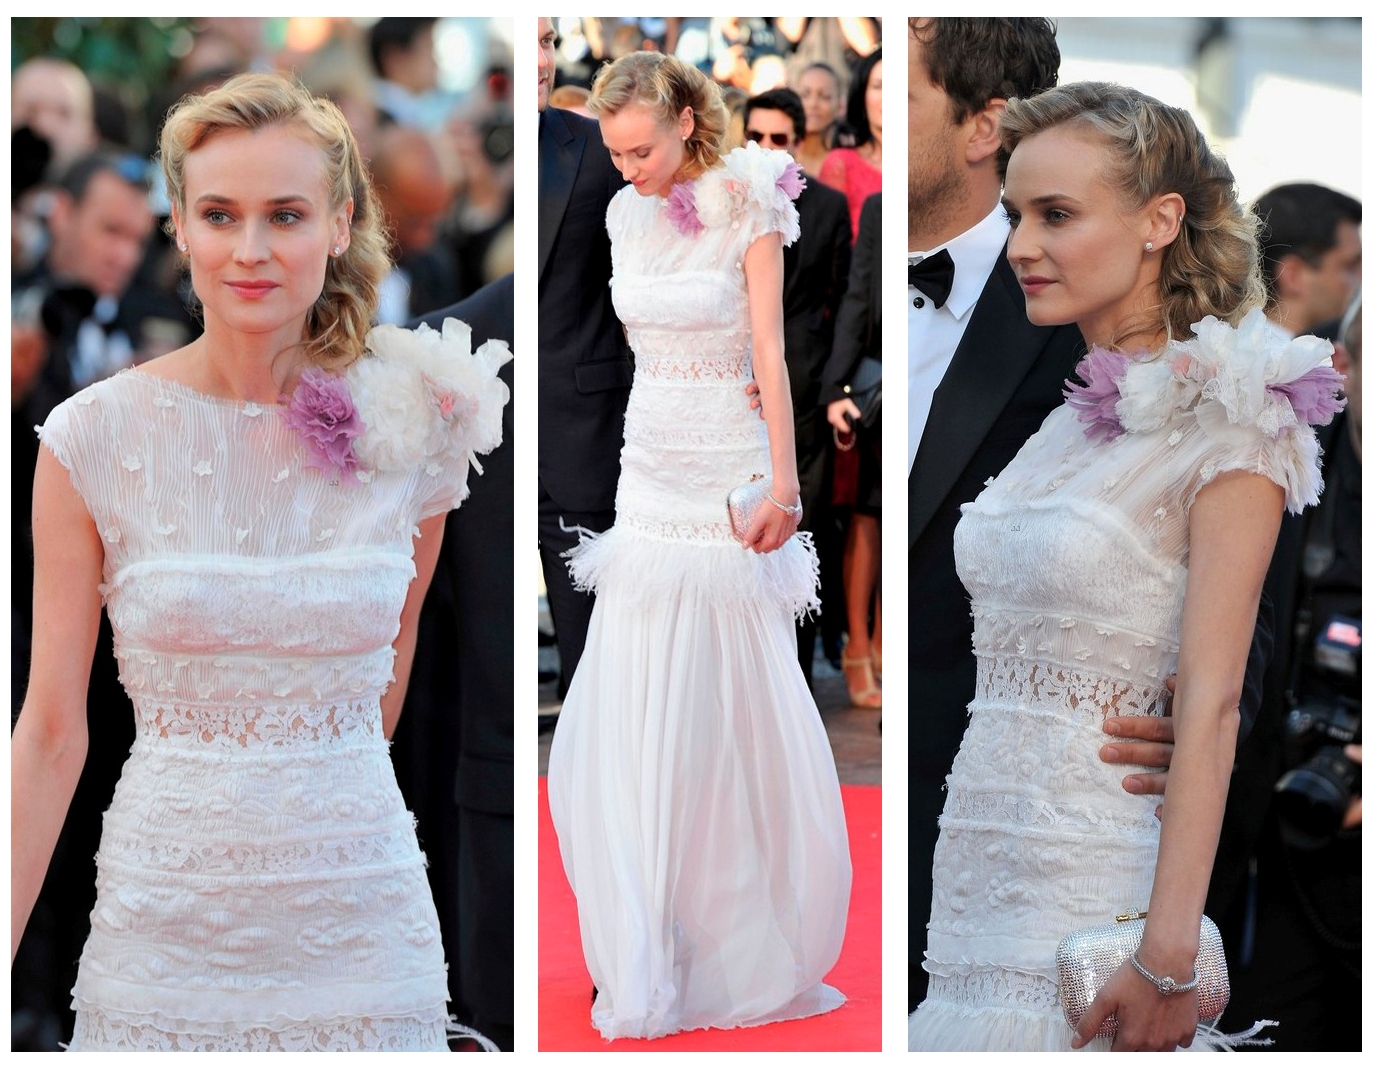 http://2.bp.blogspot.com/-xj4IBK2zc-0/UFXYvPZHddI/AAAAAAAAAR4/b5oBPQUvy6Q/s1600/Diane-Kruger-Cannes-2012-Nina-Ricci-dress.jpg